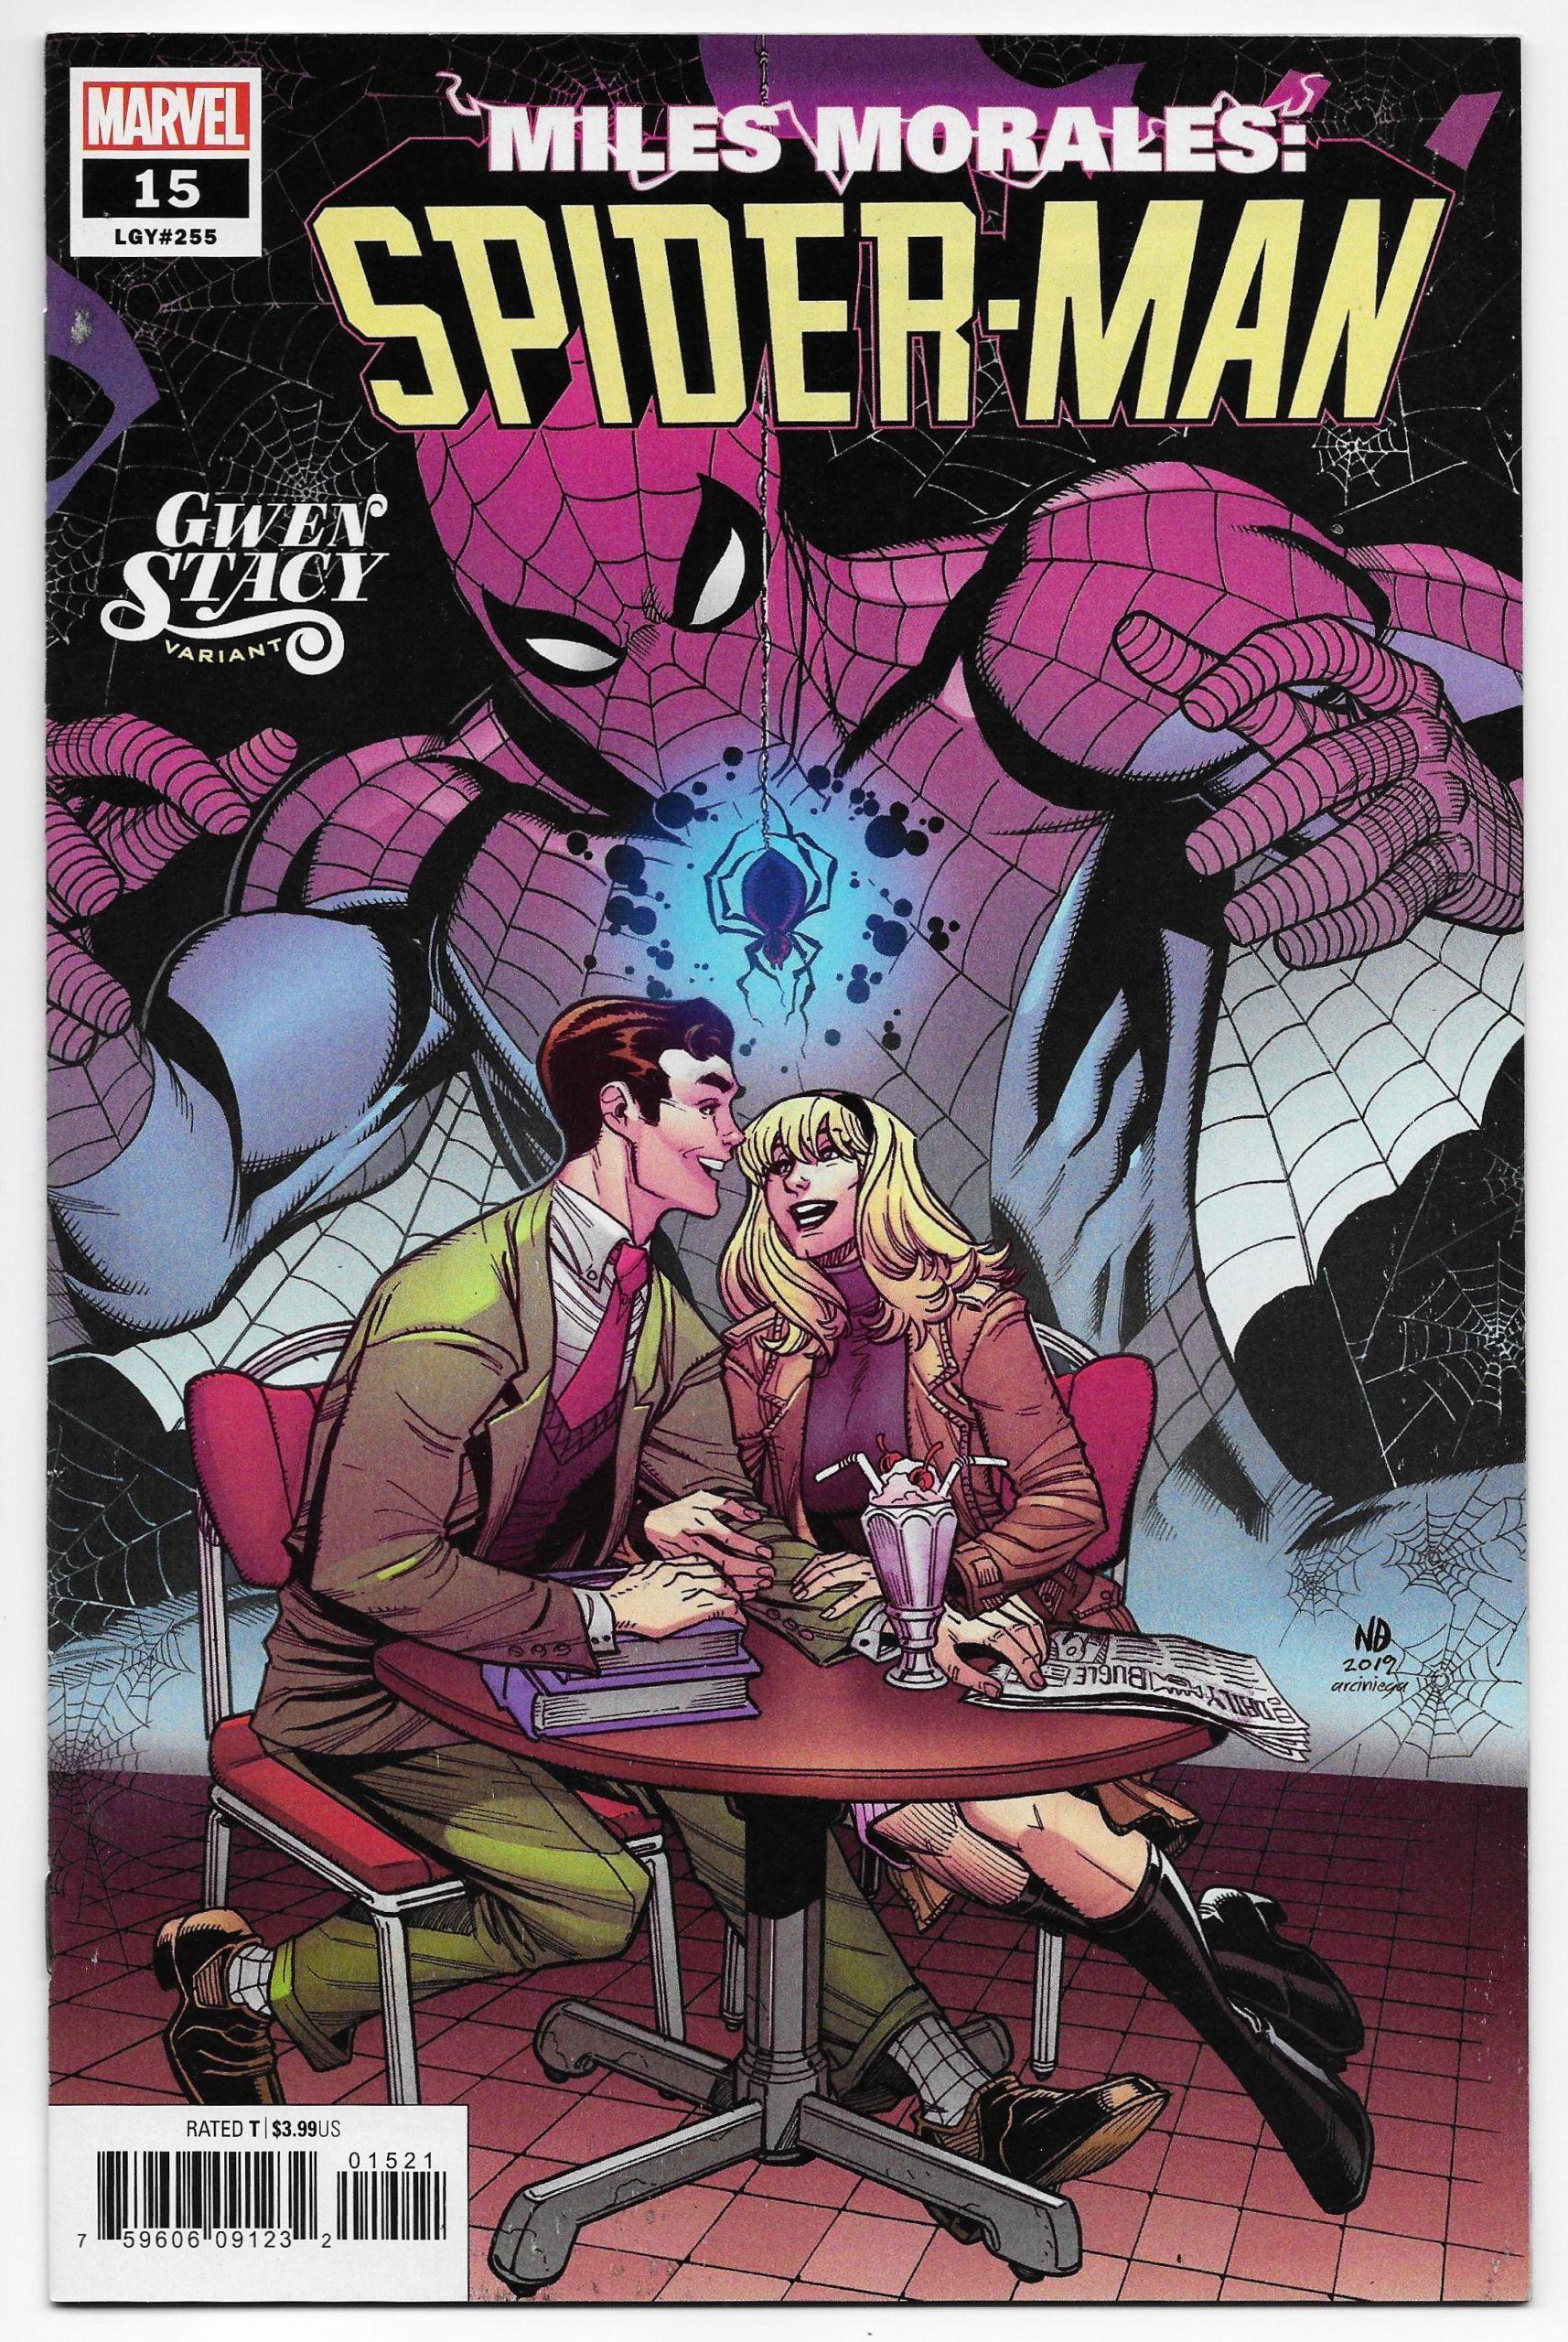 Marvel Miles Morales Spider-man #10 Comic Book 2019